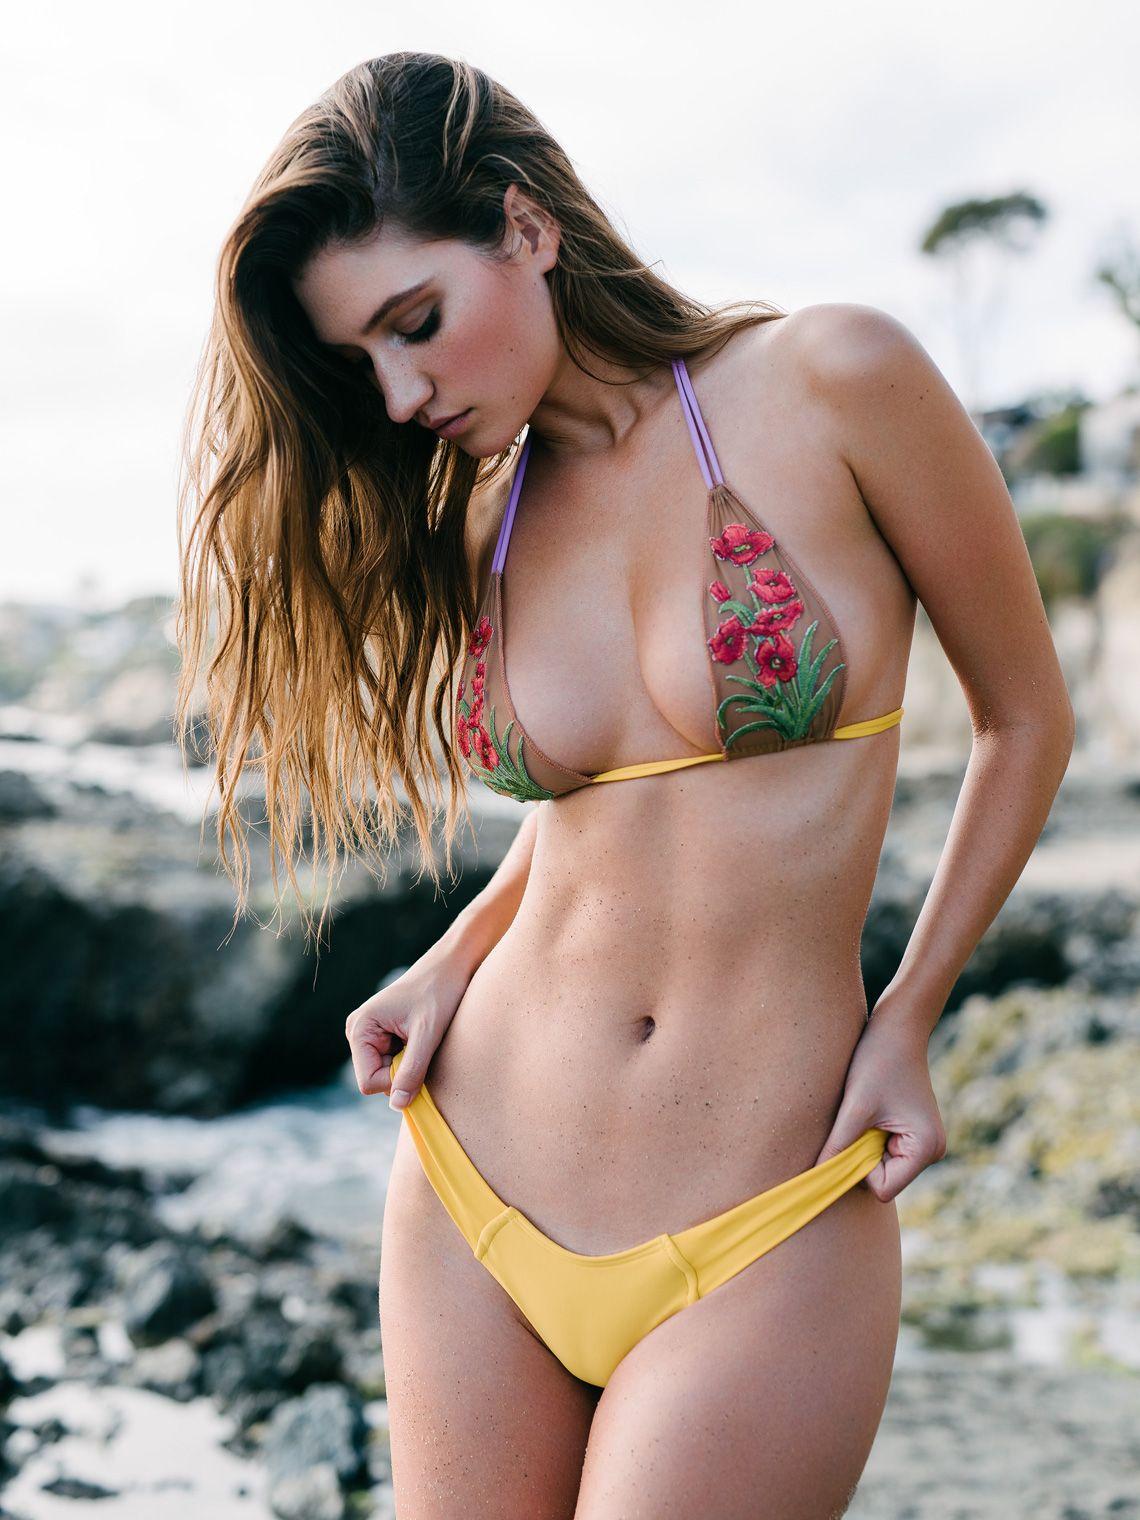 nudes (64 photo), Hot Celebrity pics